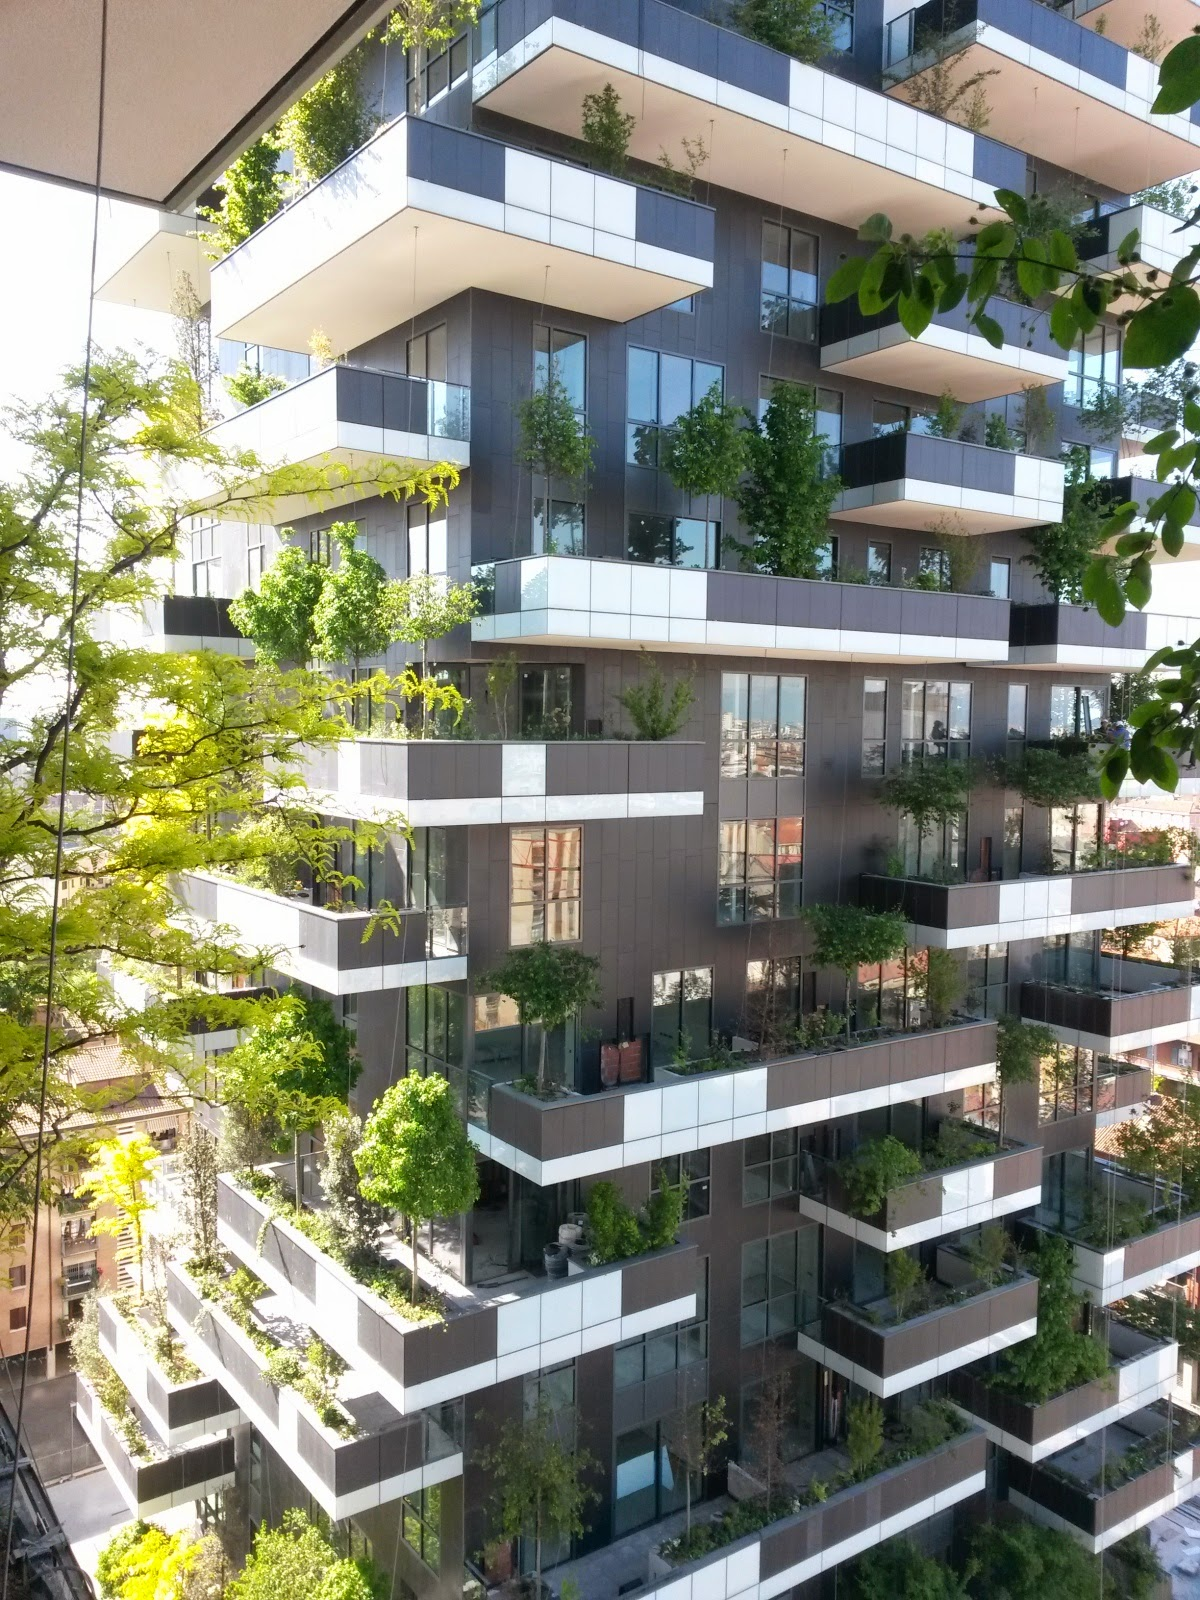 Urbanfile milano zona isola panorama dal bosco verticale for Giardino verticale